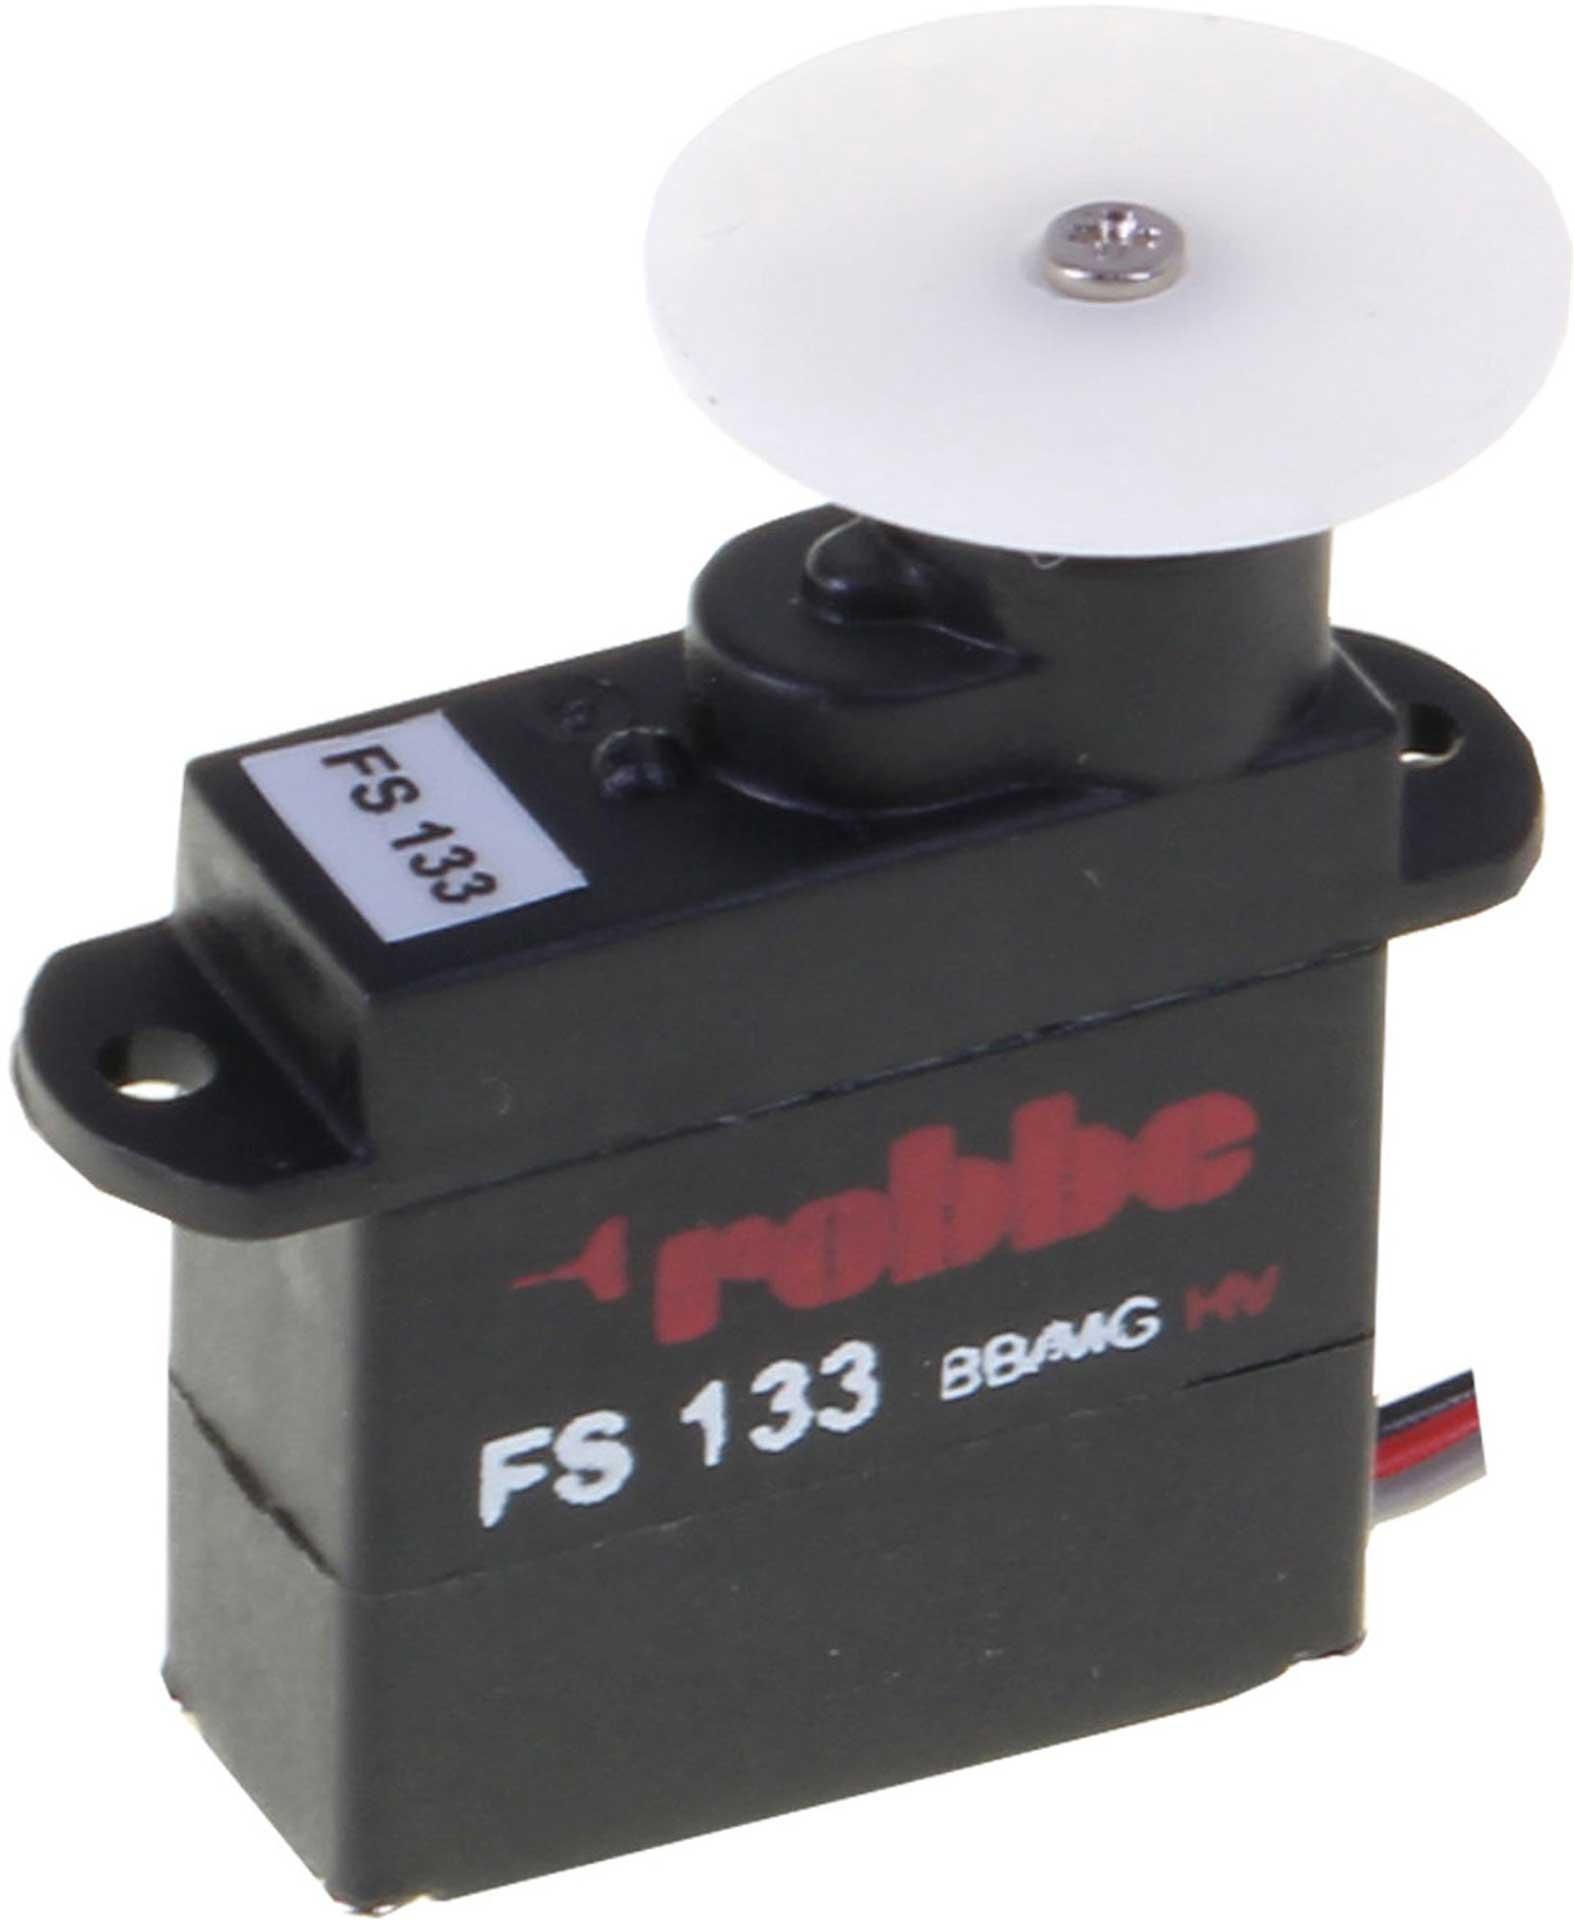 Robbe Modellsport FS 133 BB MG HV DIGITAL SERVO